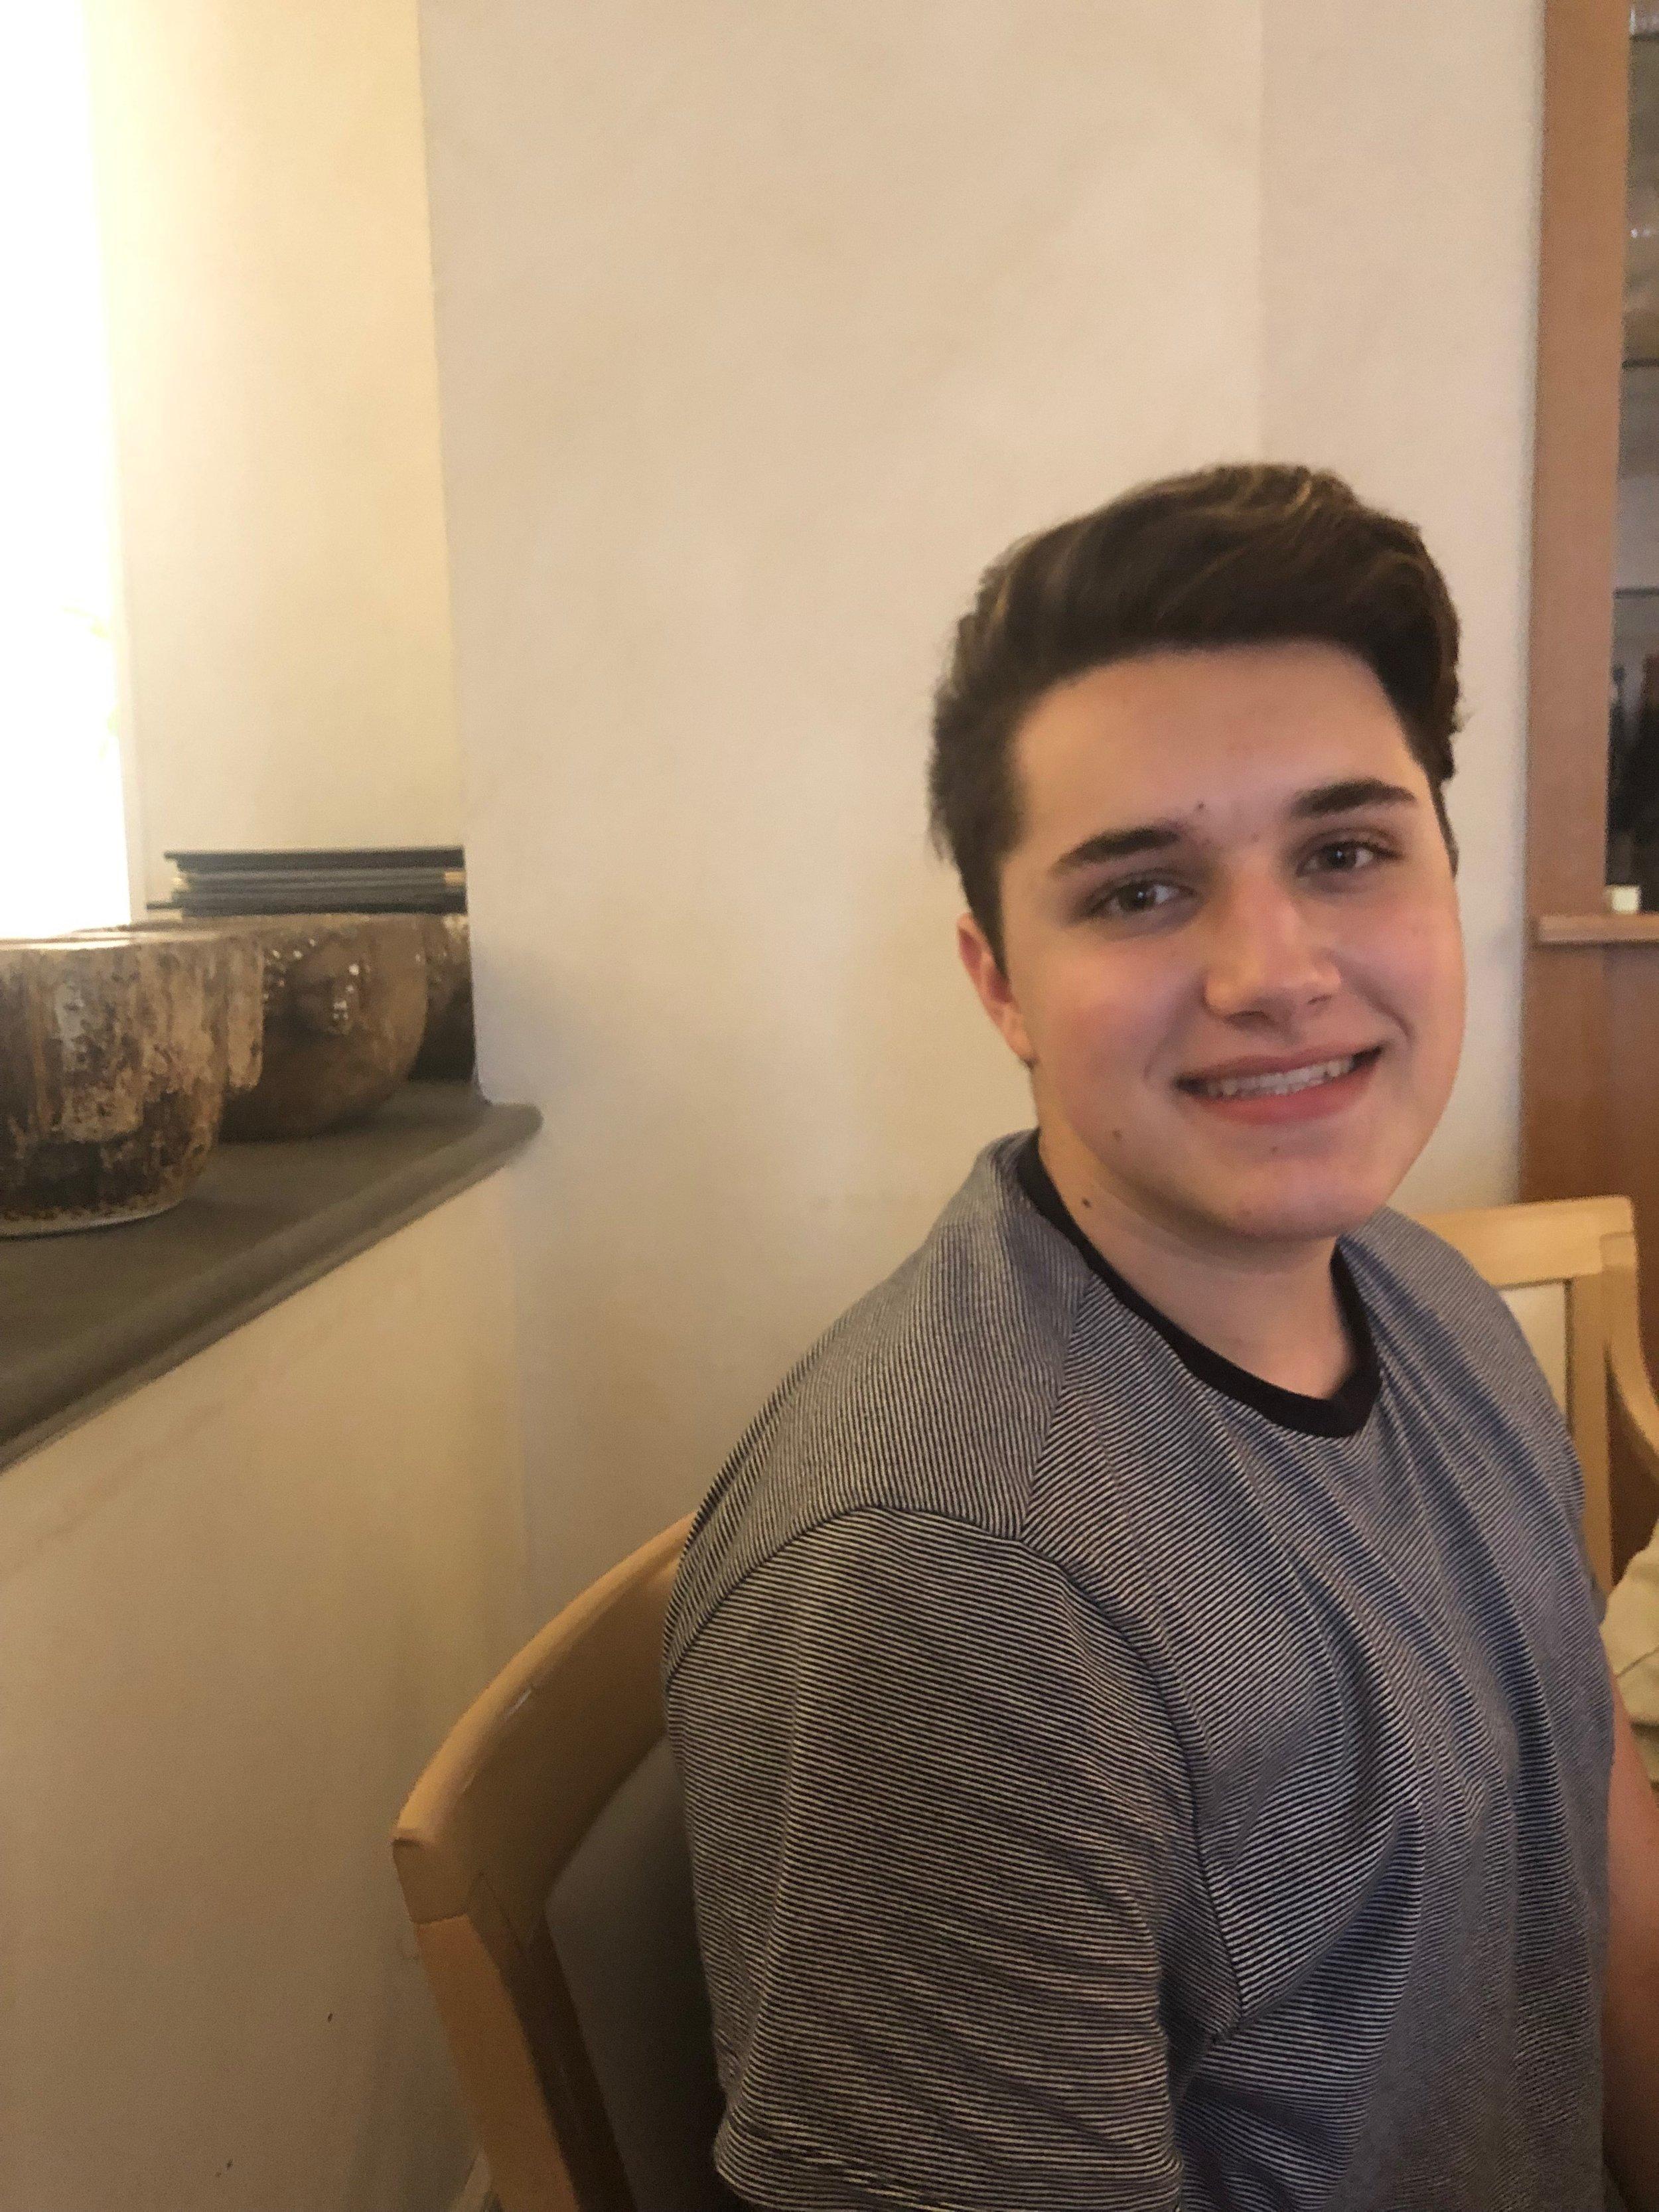 Nick - Favorite Gelato: Cioccolato e CaffèFavorite Piece He's Working On: Pur ti miroFavorite Spot in Spoleto: Crispini Gelateria